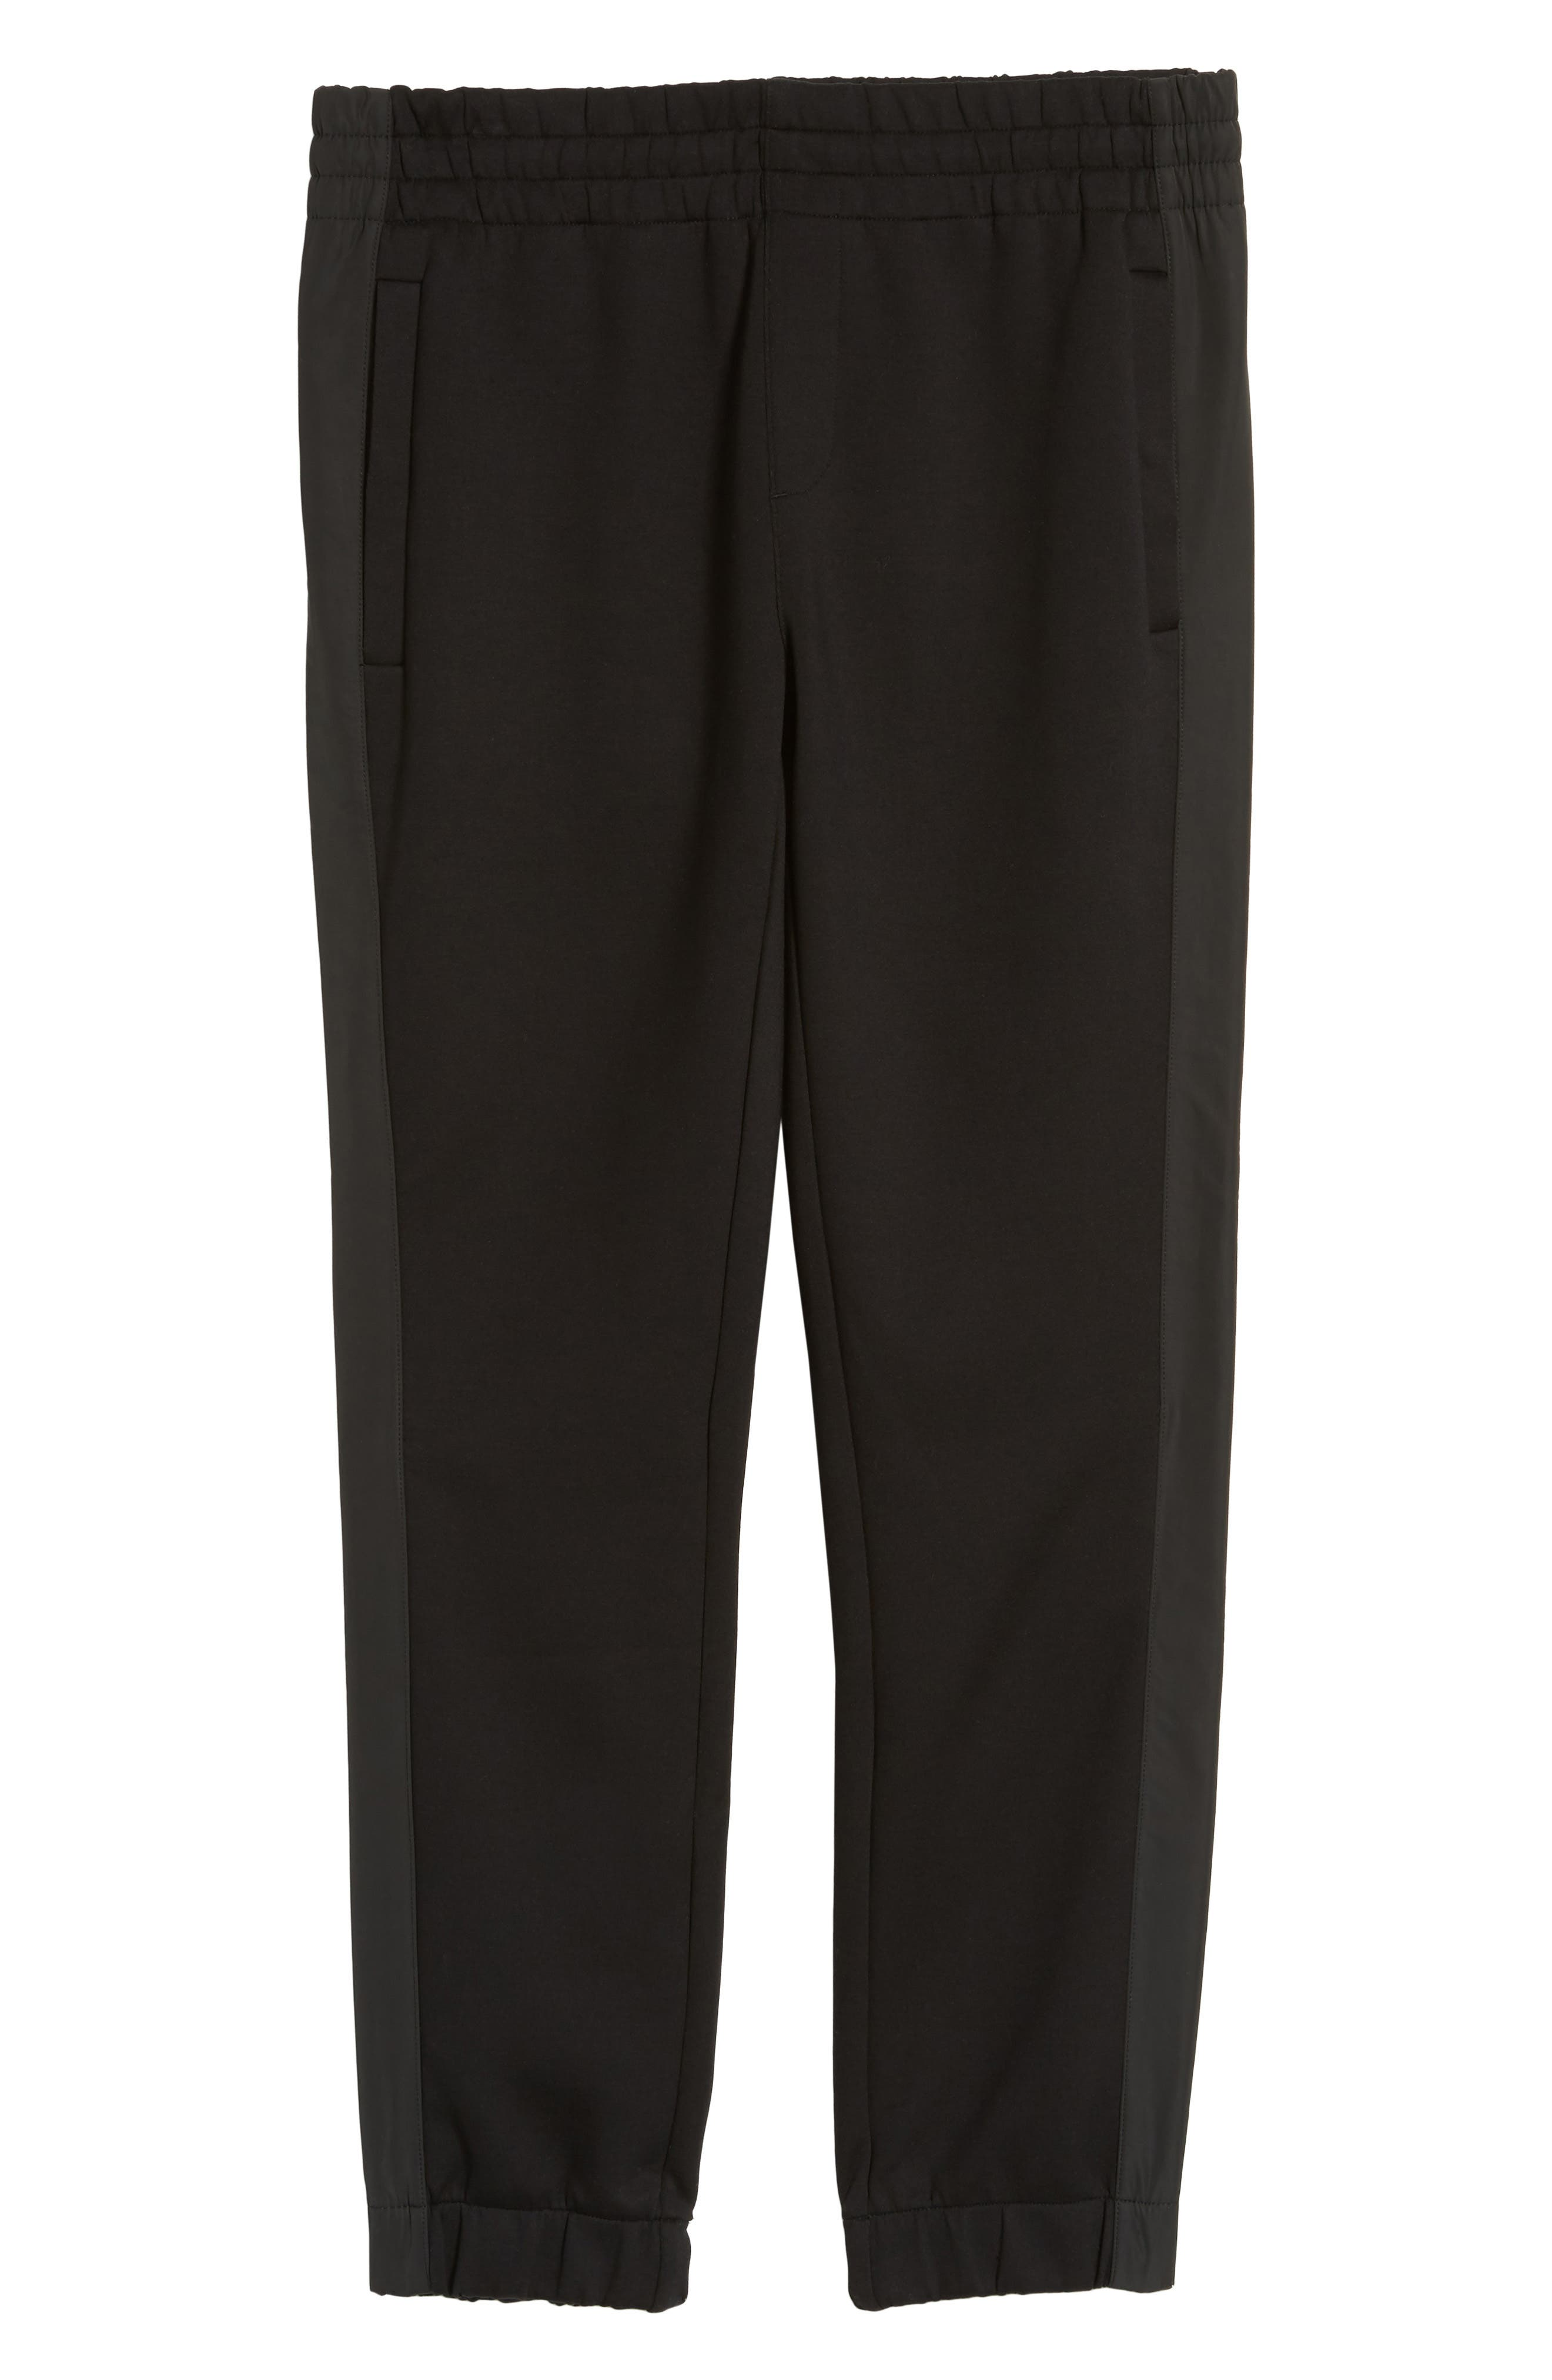 Lamont Mercedes Jogger Pants,                             Alternate thumbnail 6, color,                             Black